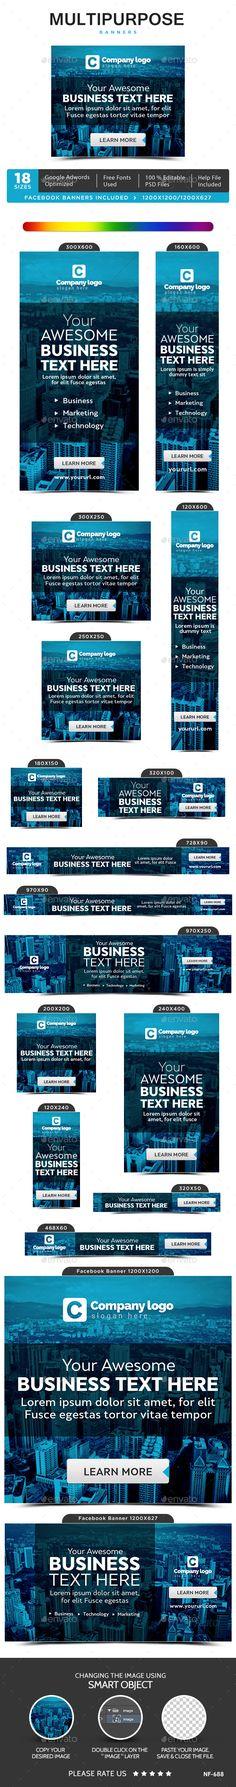 Multipurpose Web Banners Template #design #ad Download: http://graphicriver.net/item/multipurpose-banners/13112173?ref=ksioks